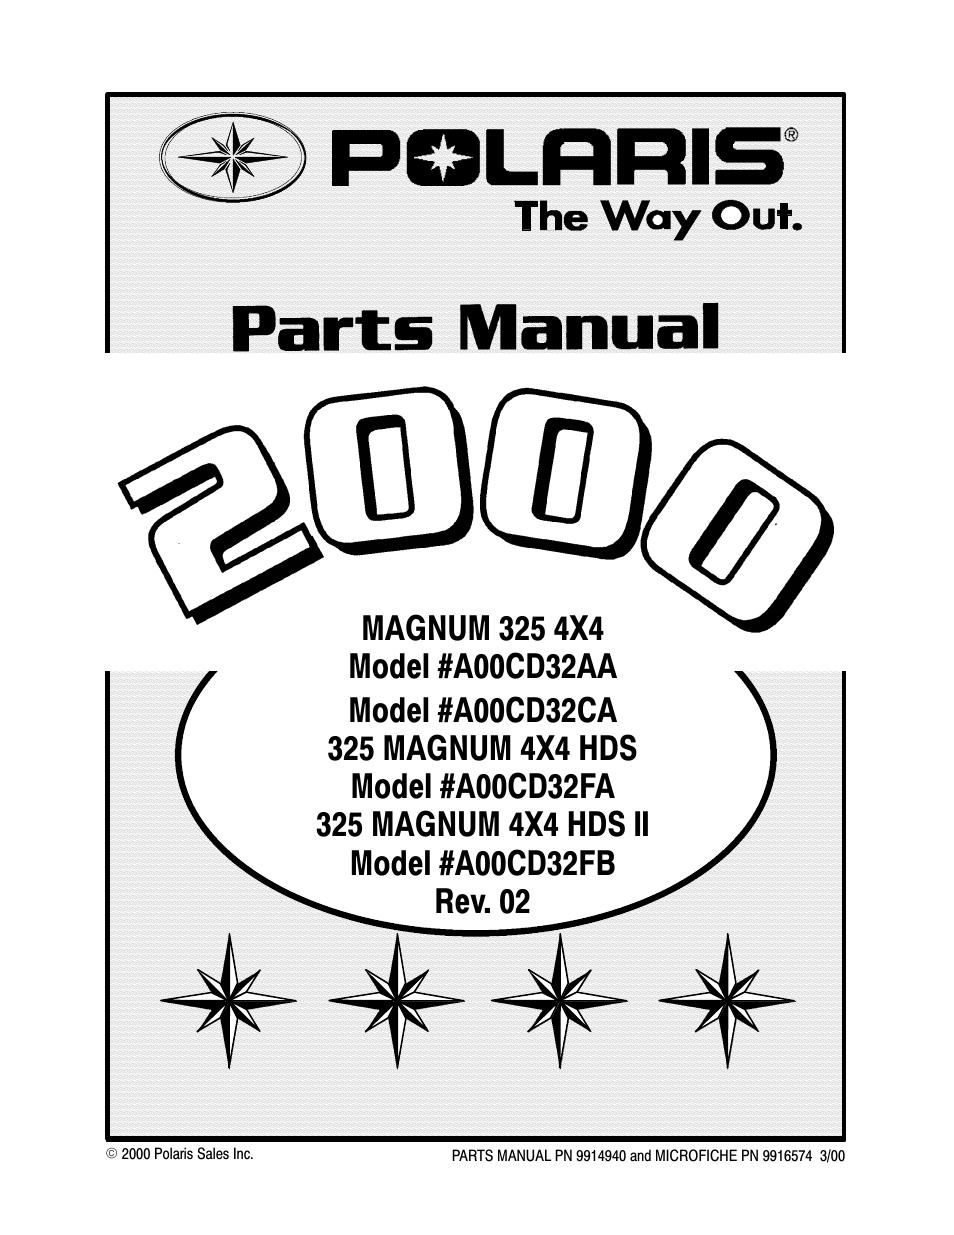 Polaris MAGNUM 325 4X4 A00CD32AA User Manual | 59 pages | Also for: 325  MAGNUM 4X4 HDS II A00CD32FB, 325 MAGNUM 4X4 HDS A00CD32FA